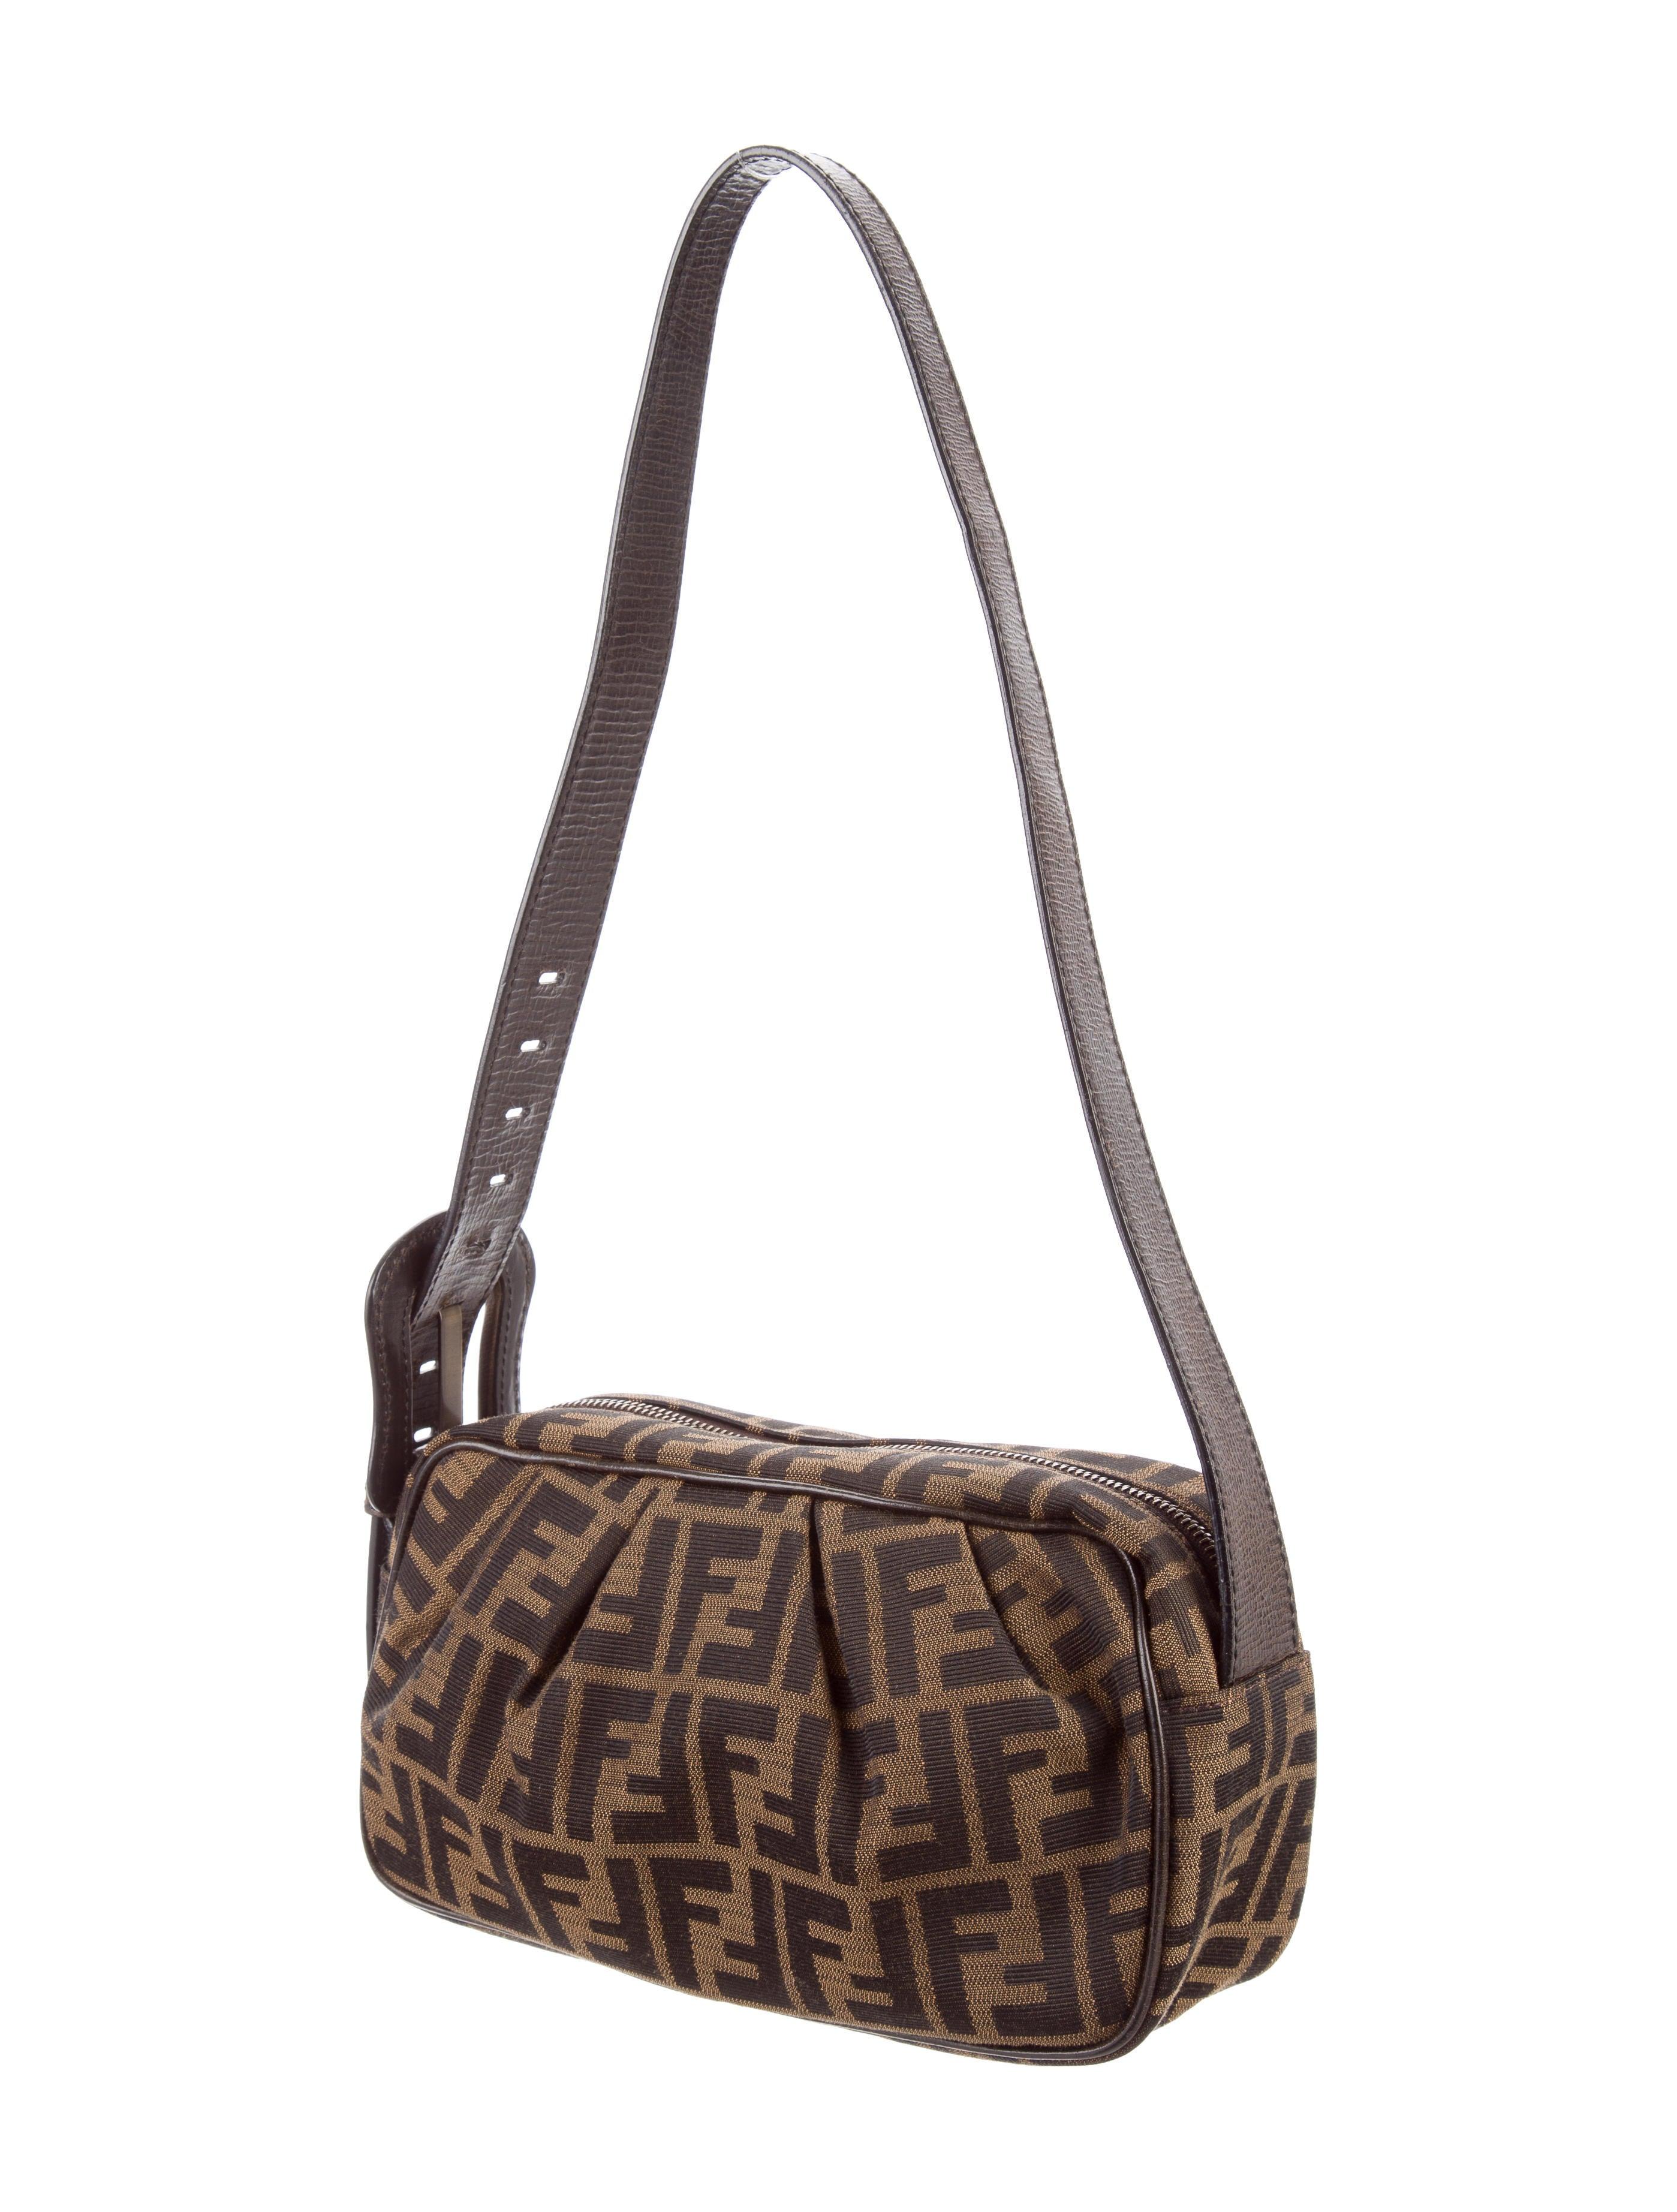 Fendi Leather Trimmed Zucca Bag Handbags Fen55700